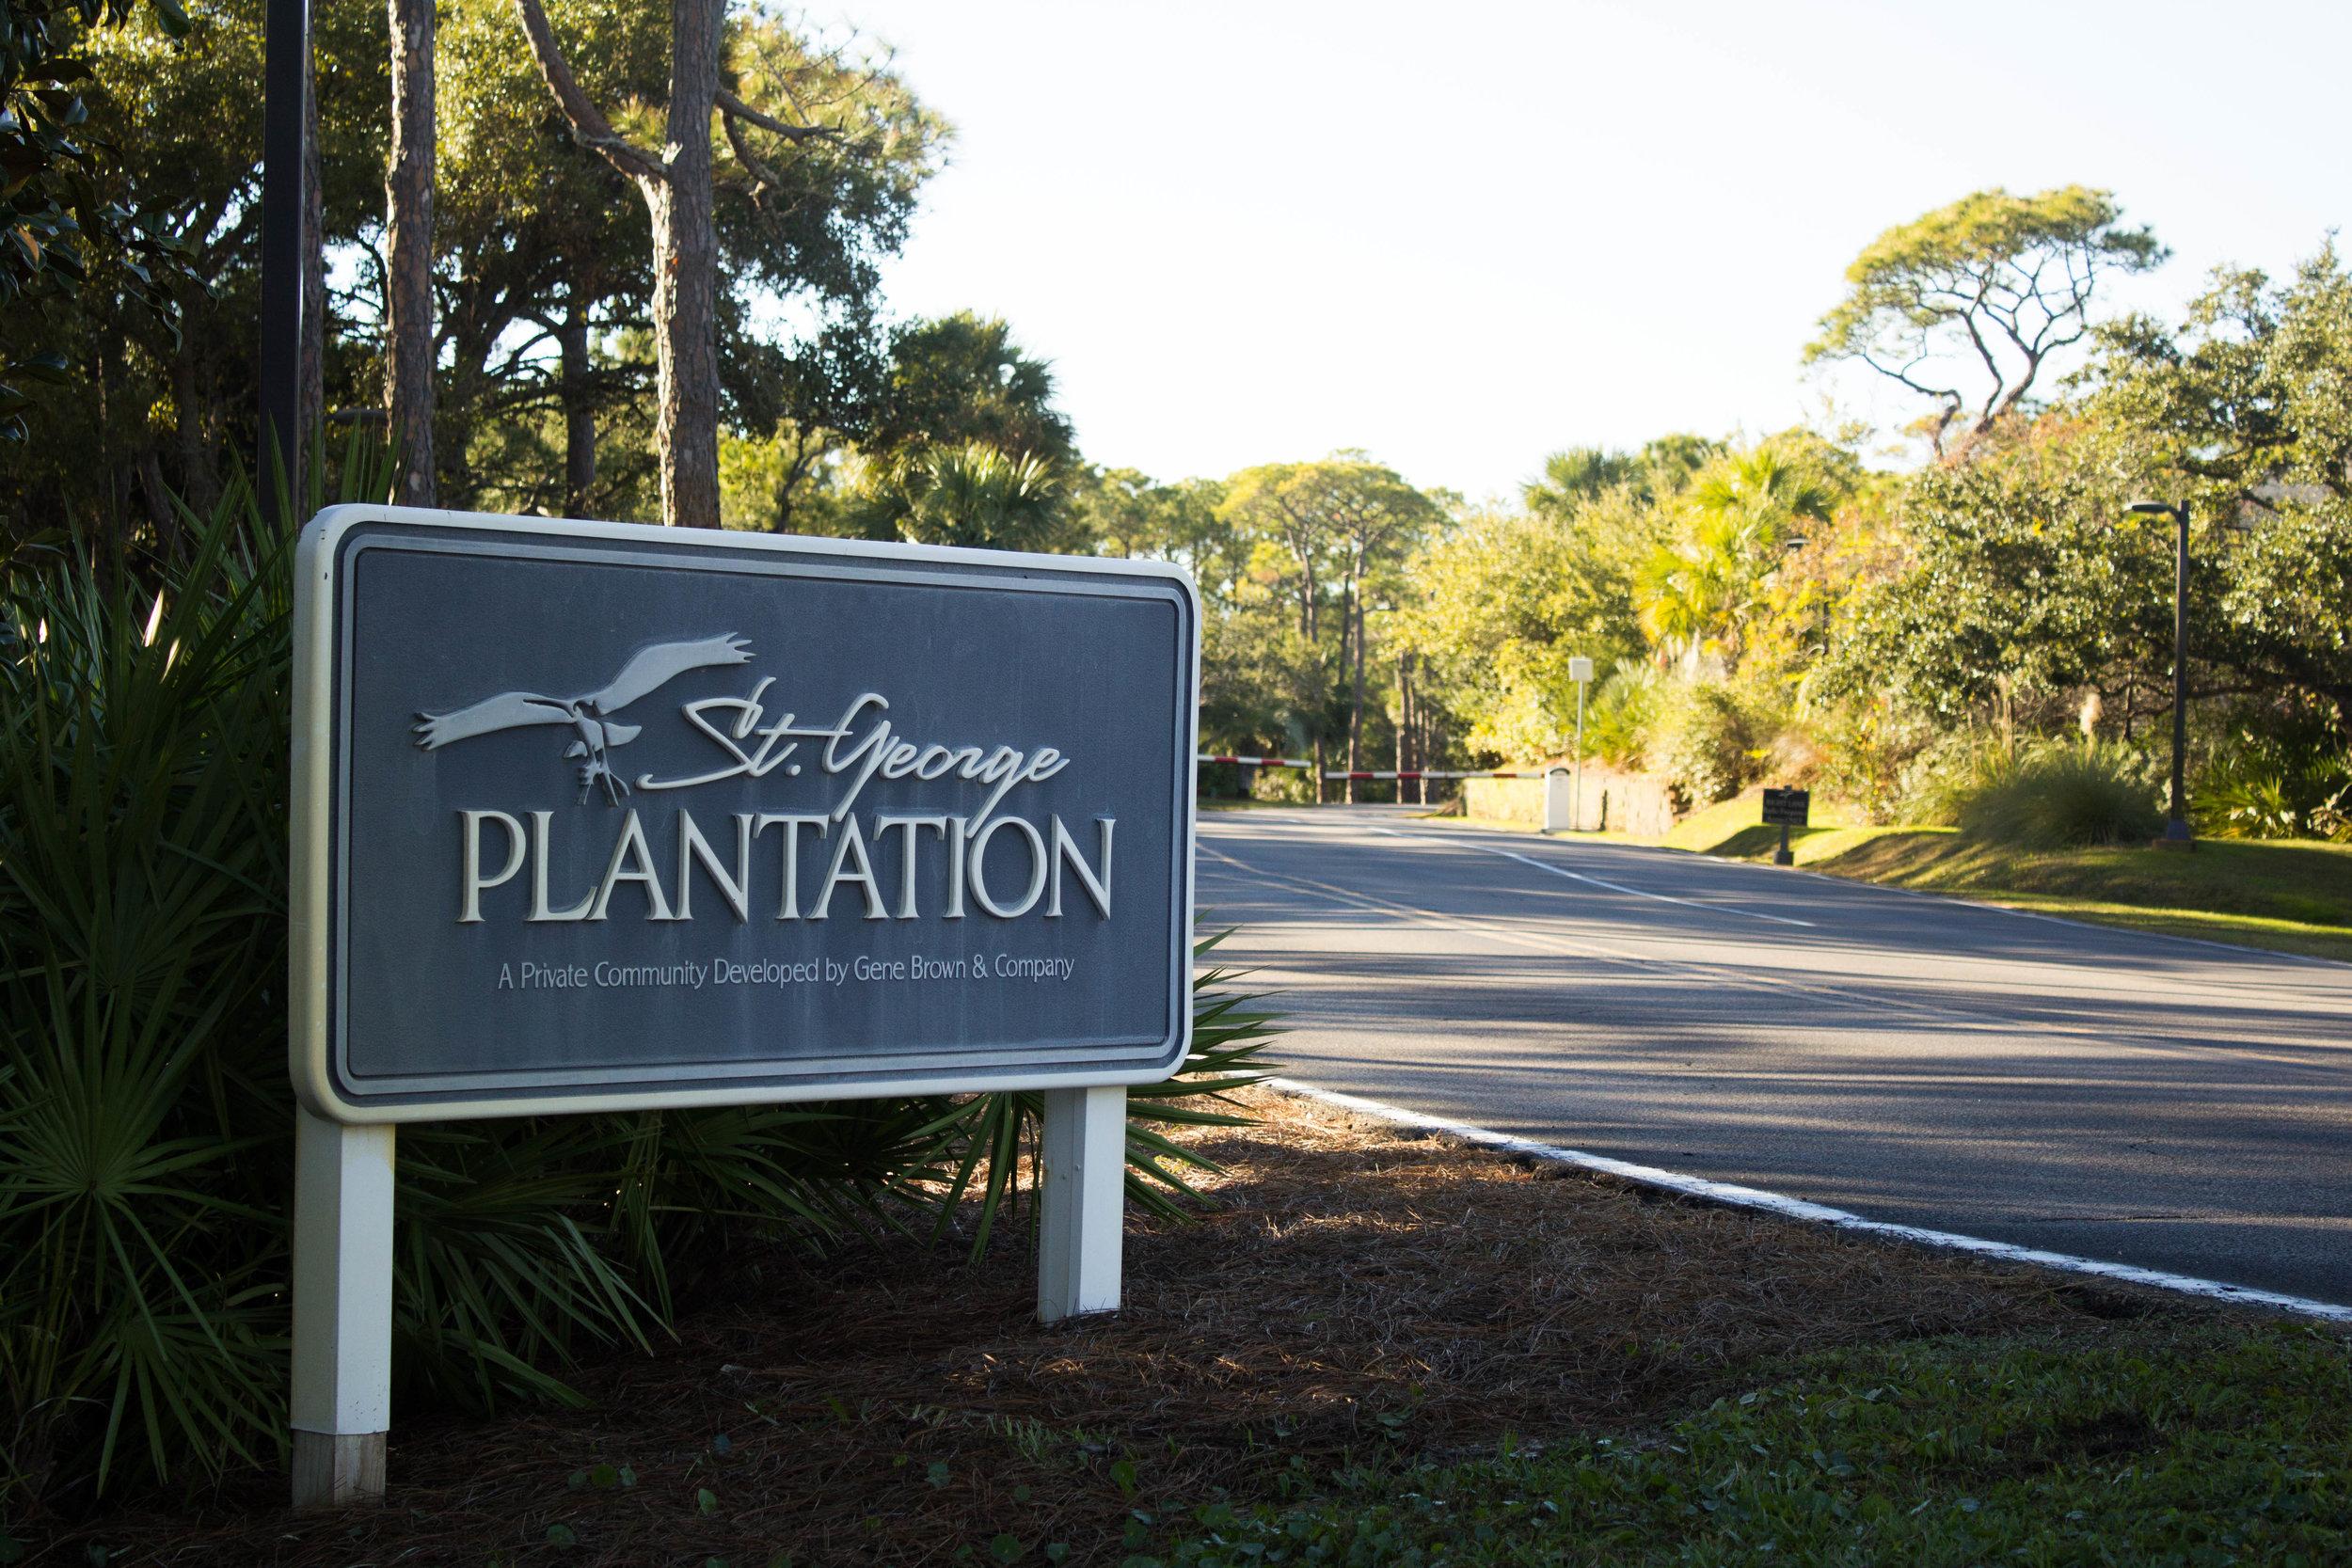 St. George Plantation Gated Community